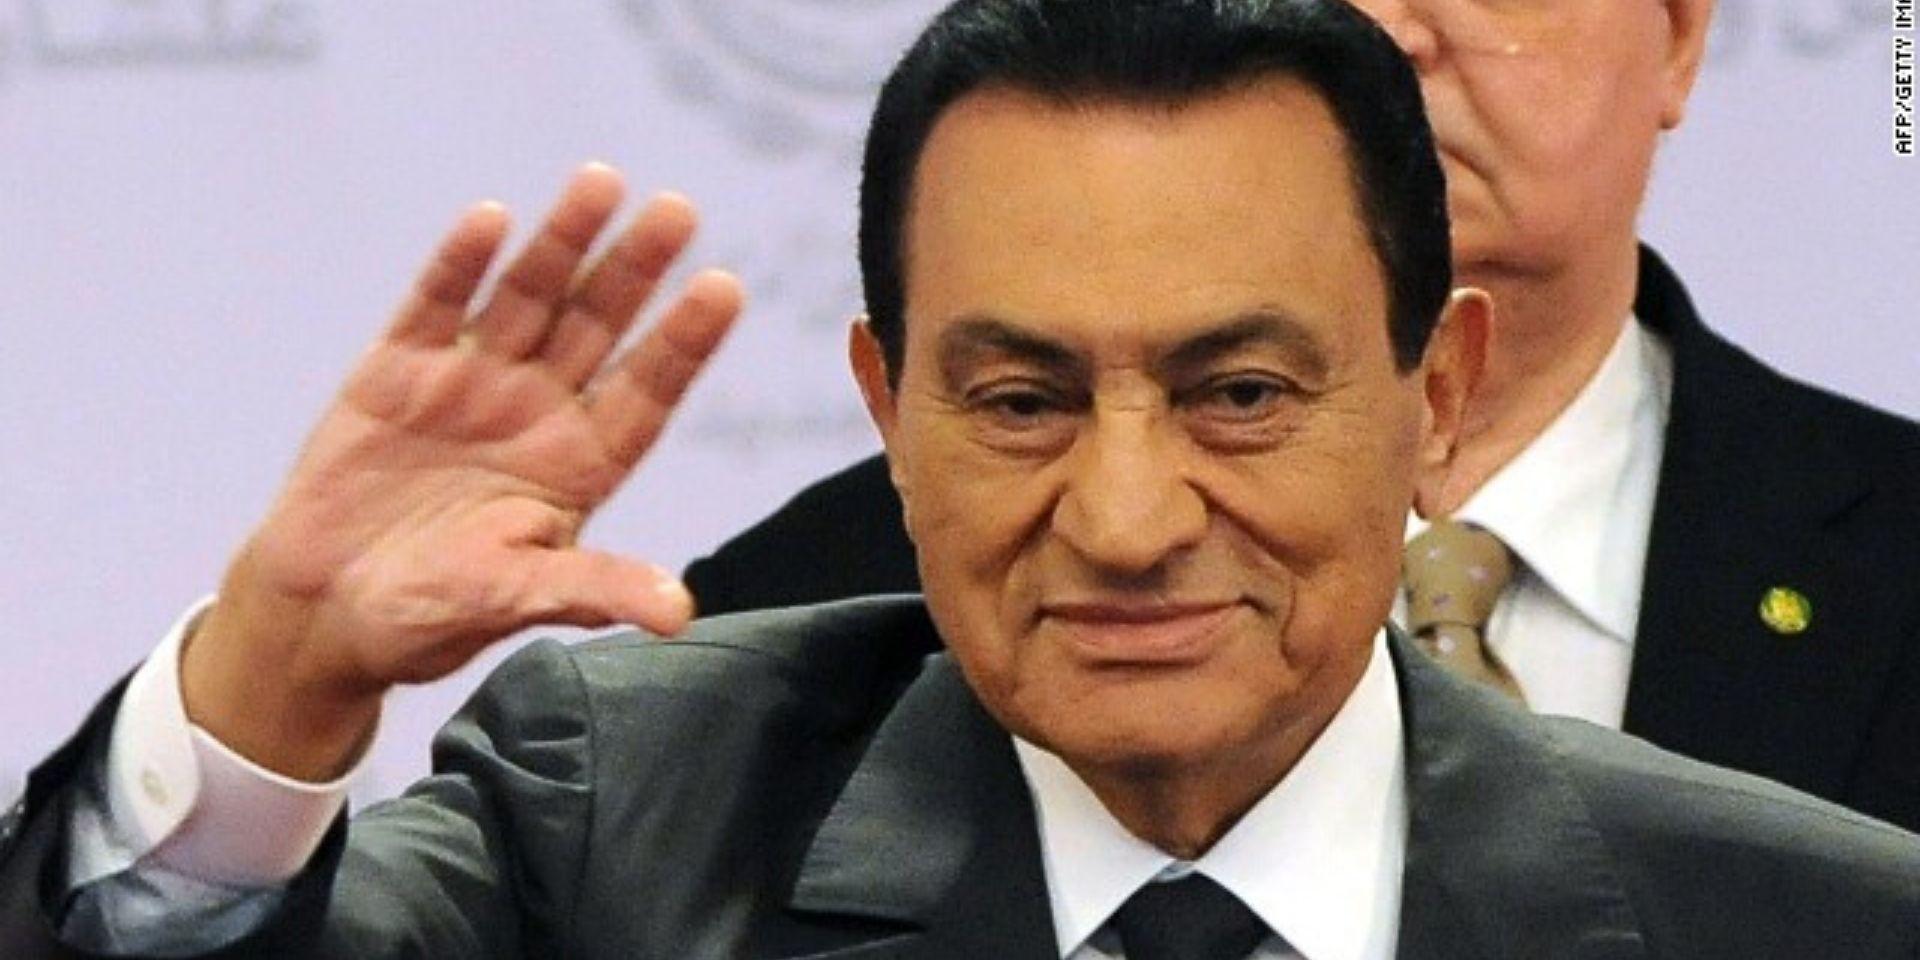 Hosni Mubarak, Format Egyptian President, has died aged 91